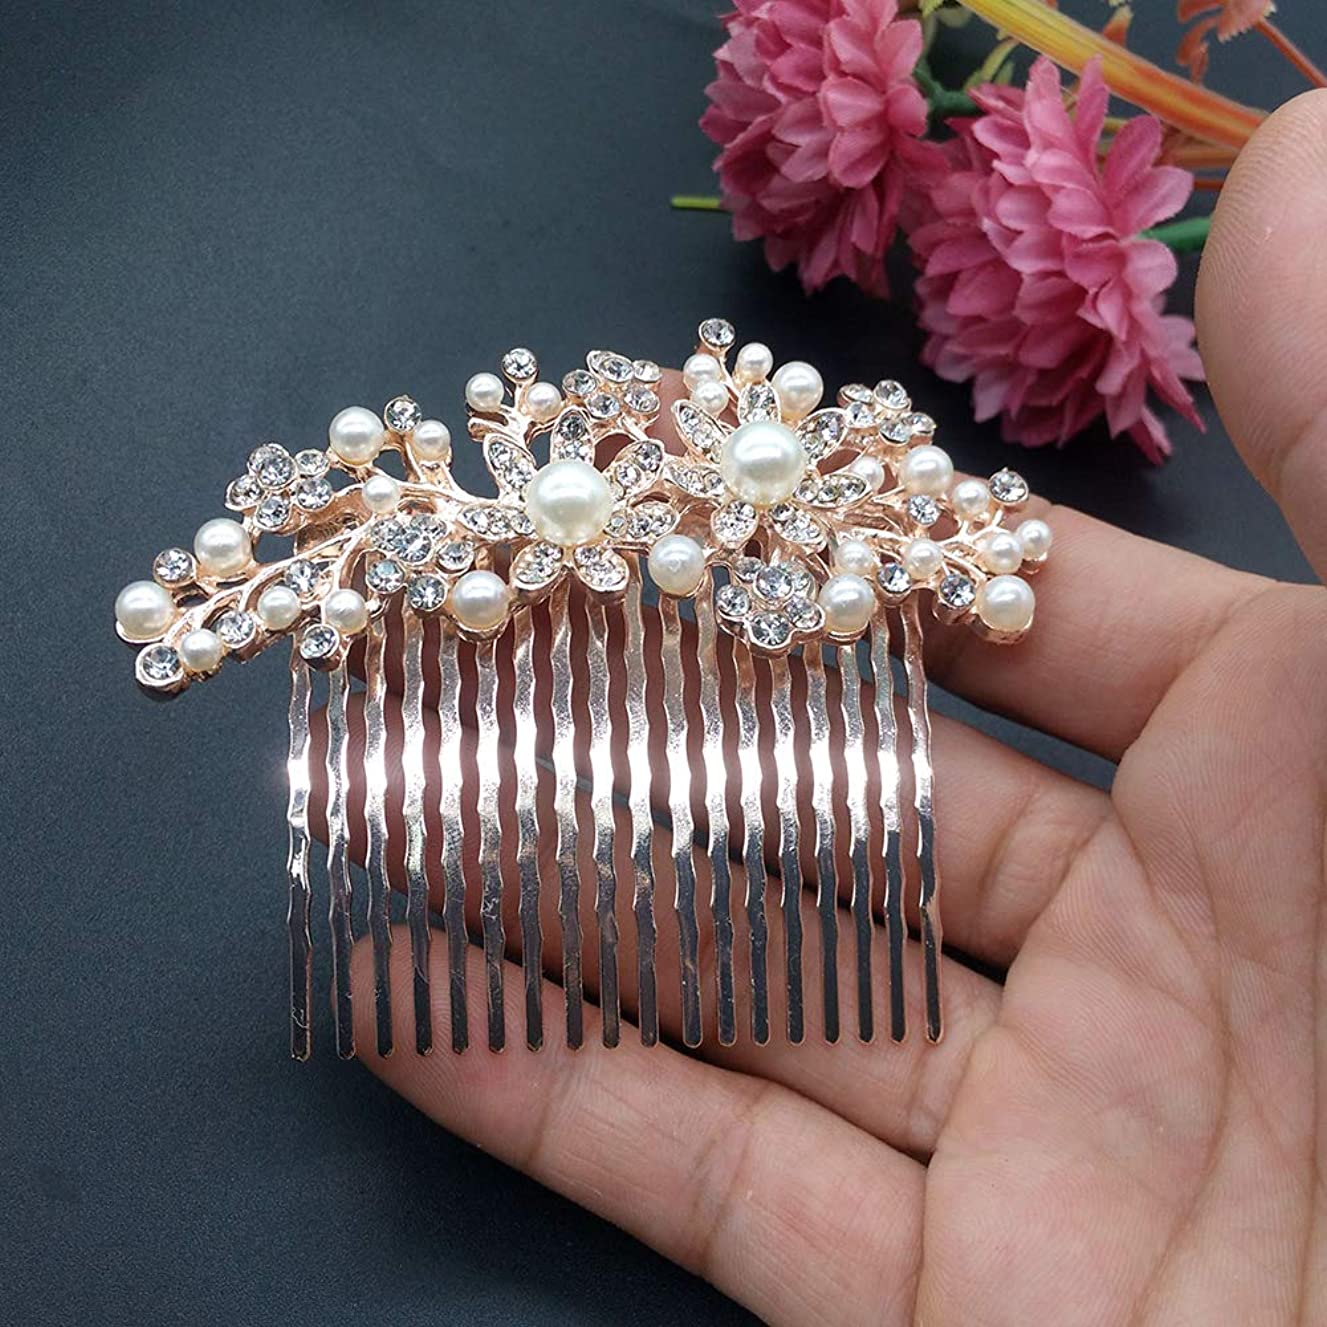 YuYe Bride Hair Decoration Flower Faux Pearl Rhinestone Comb Hairpin Women Jewelry - Golden